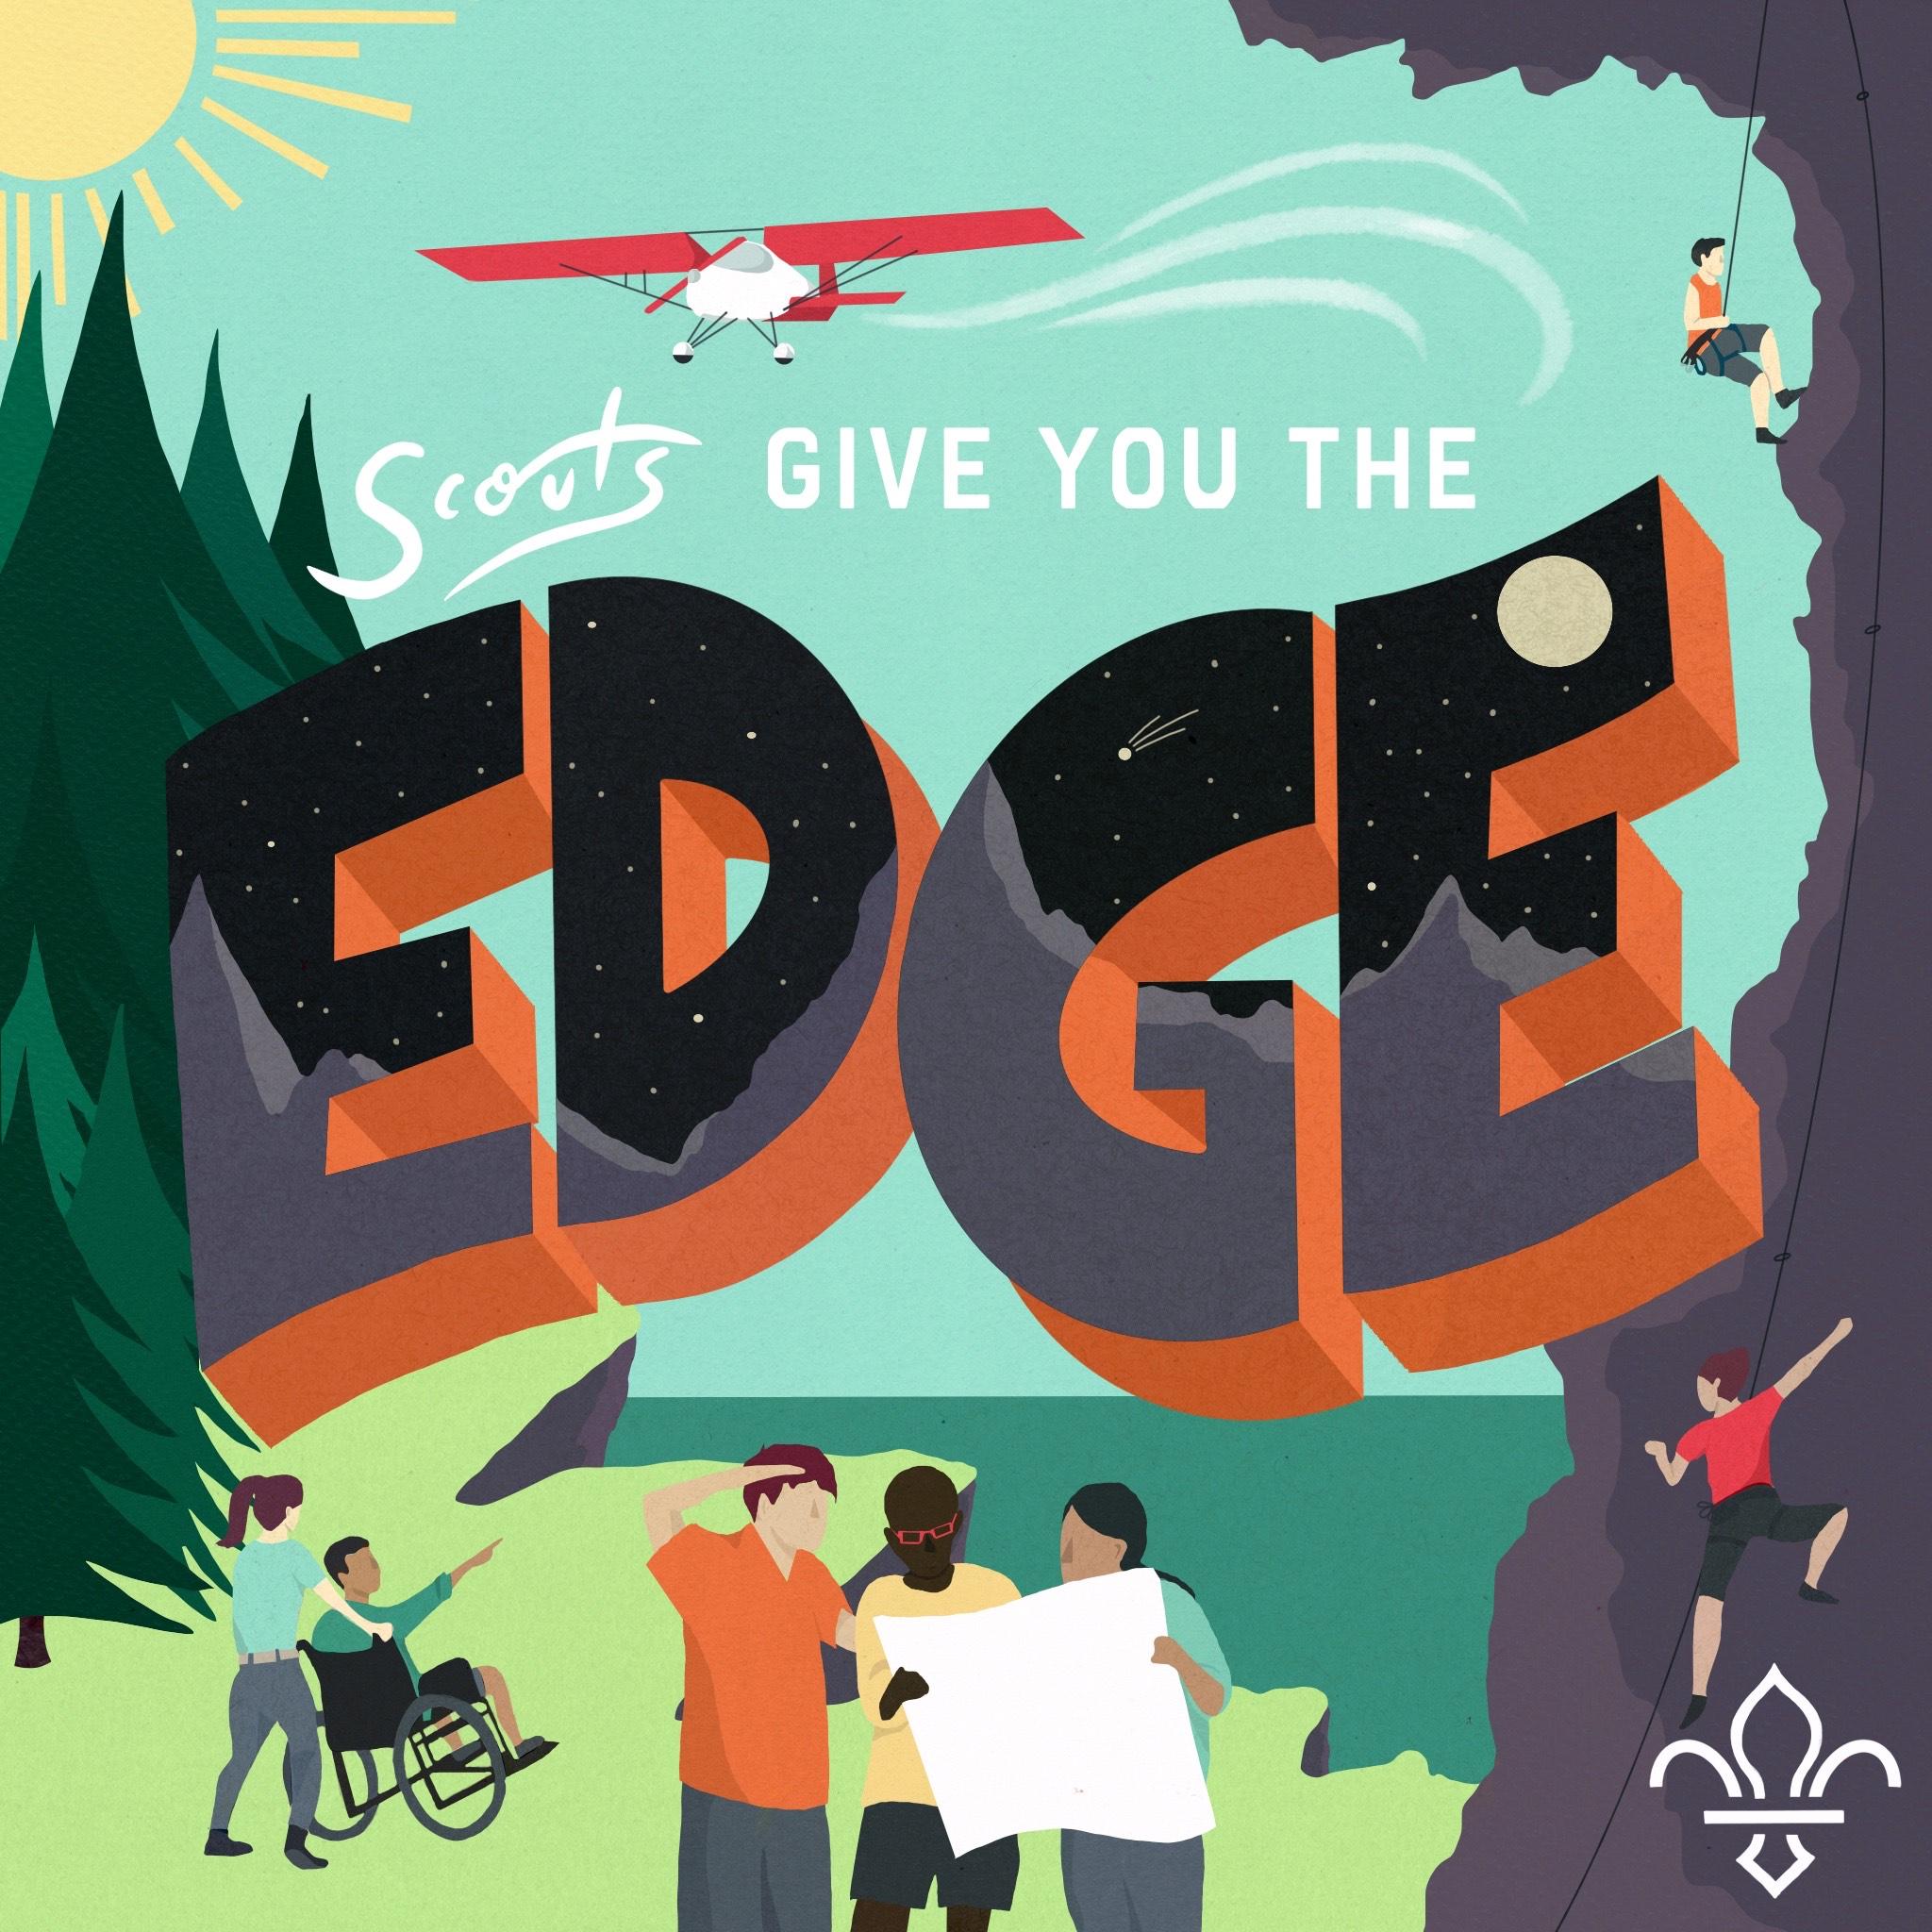 Scouts social media campaign